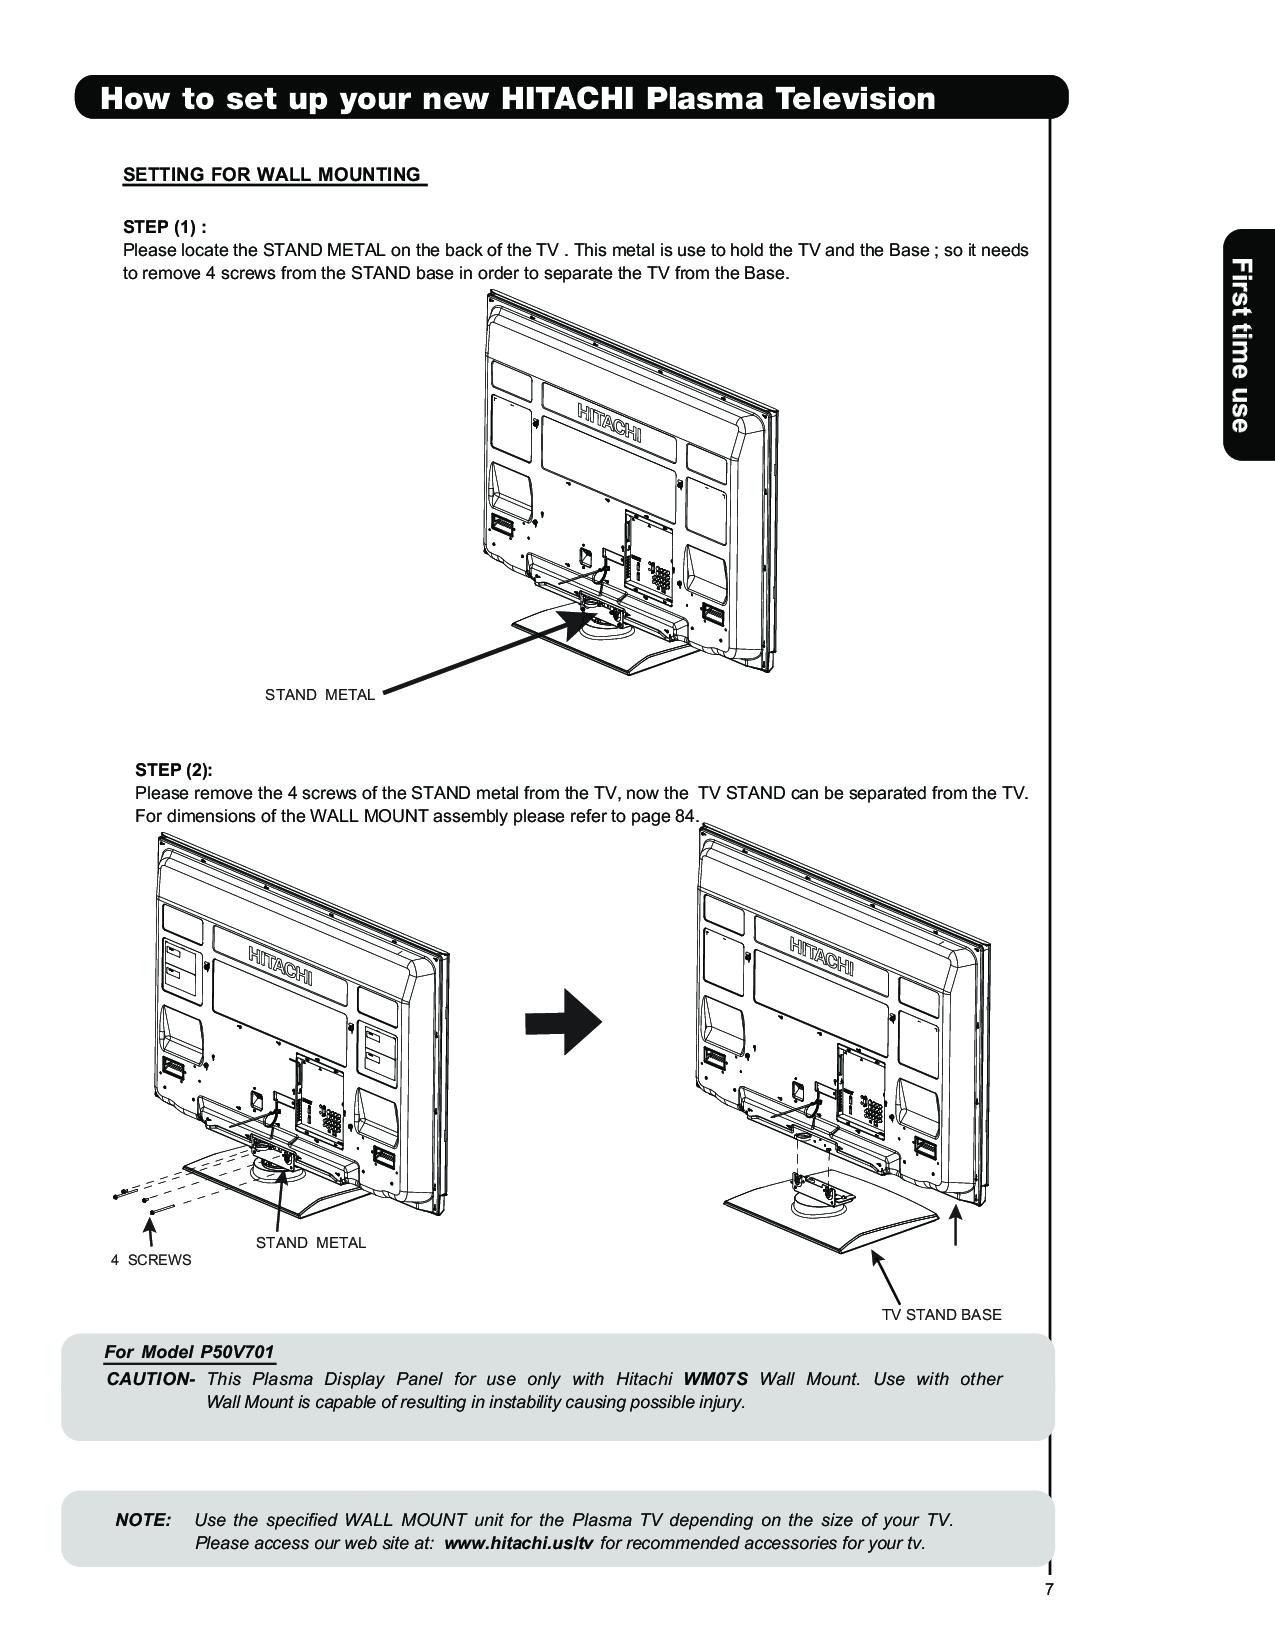 Hitachi P50v701 User Manual